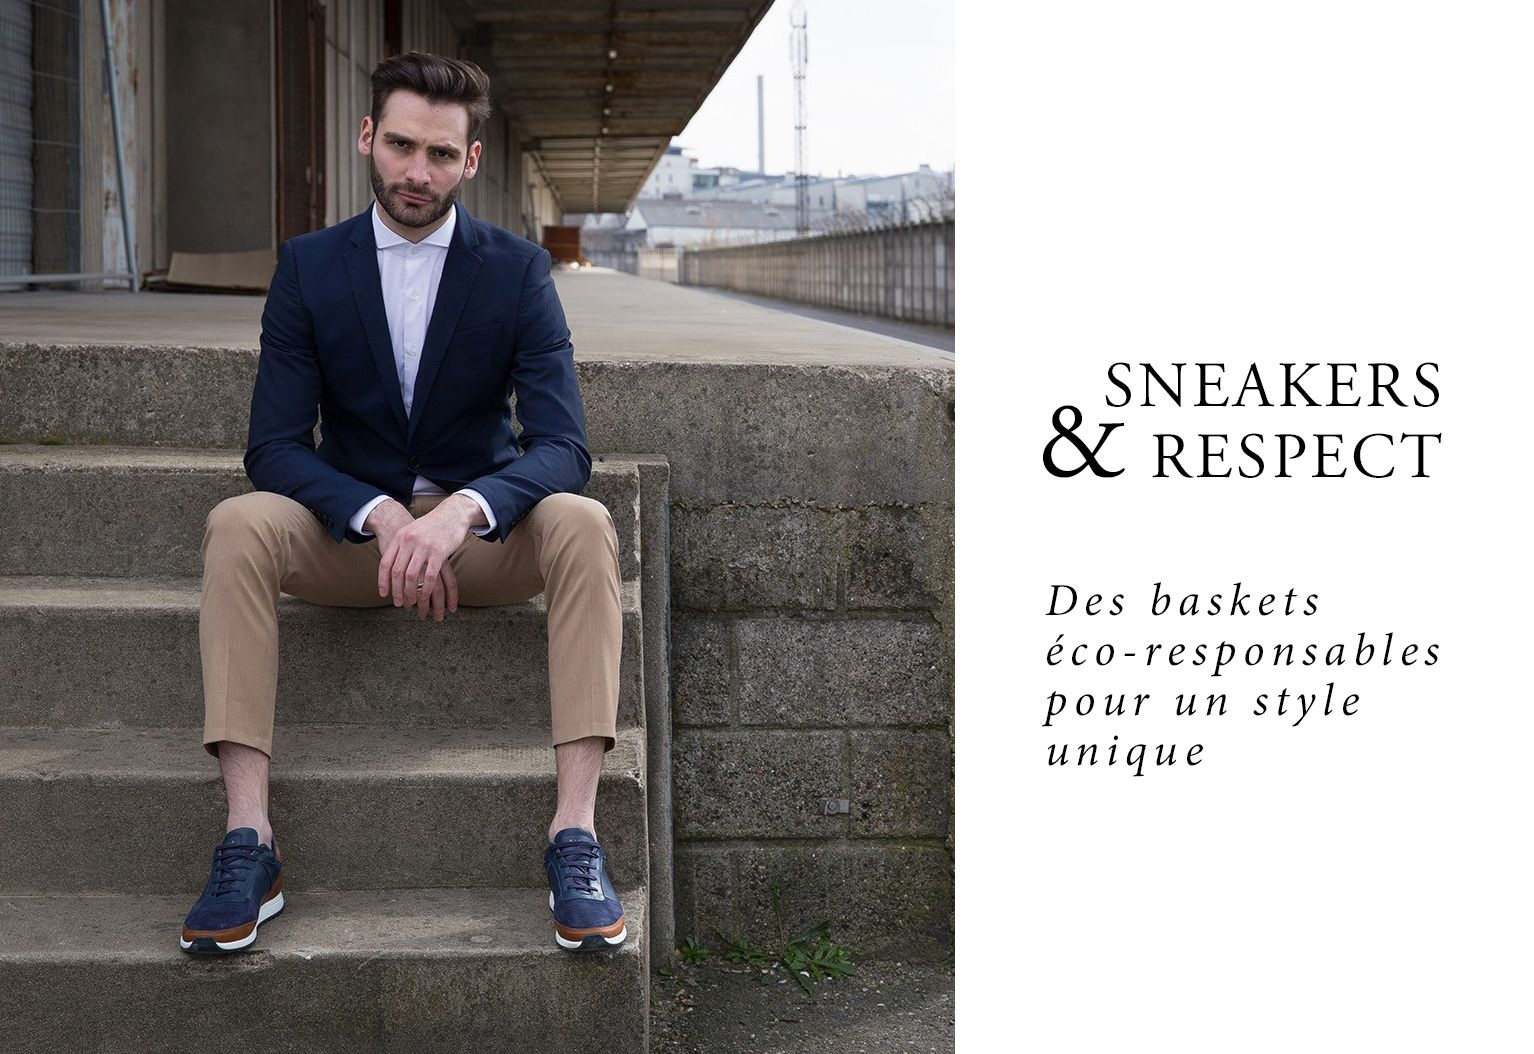 sneakers ethique consommation responsable